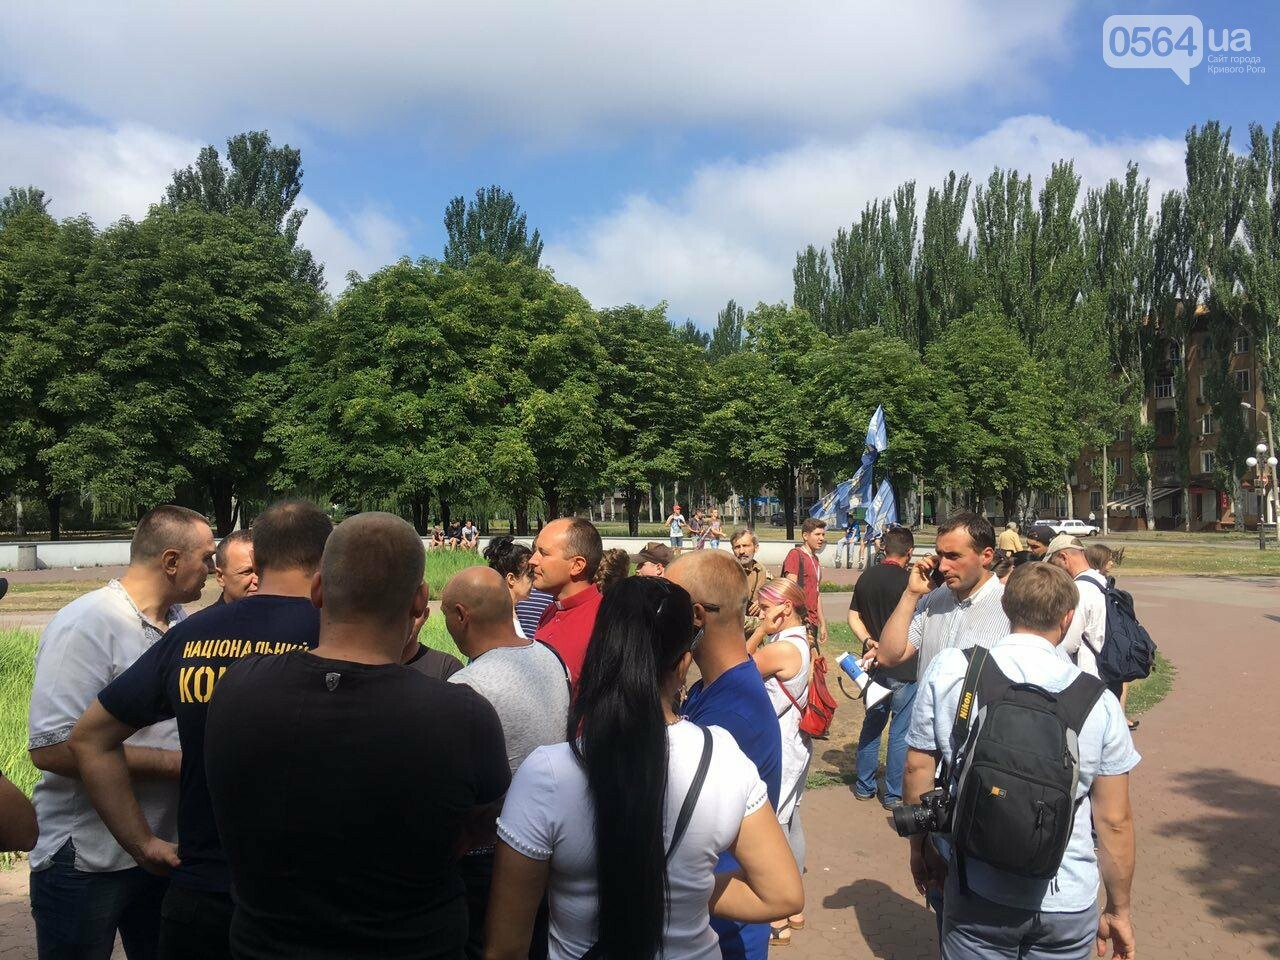 Трубят рога: В Кривом Роге собрались противники ЛГБТ-движения, - ФОТО, ВИДЕО, фото-3